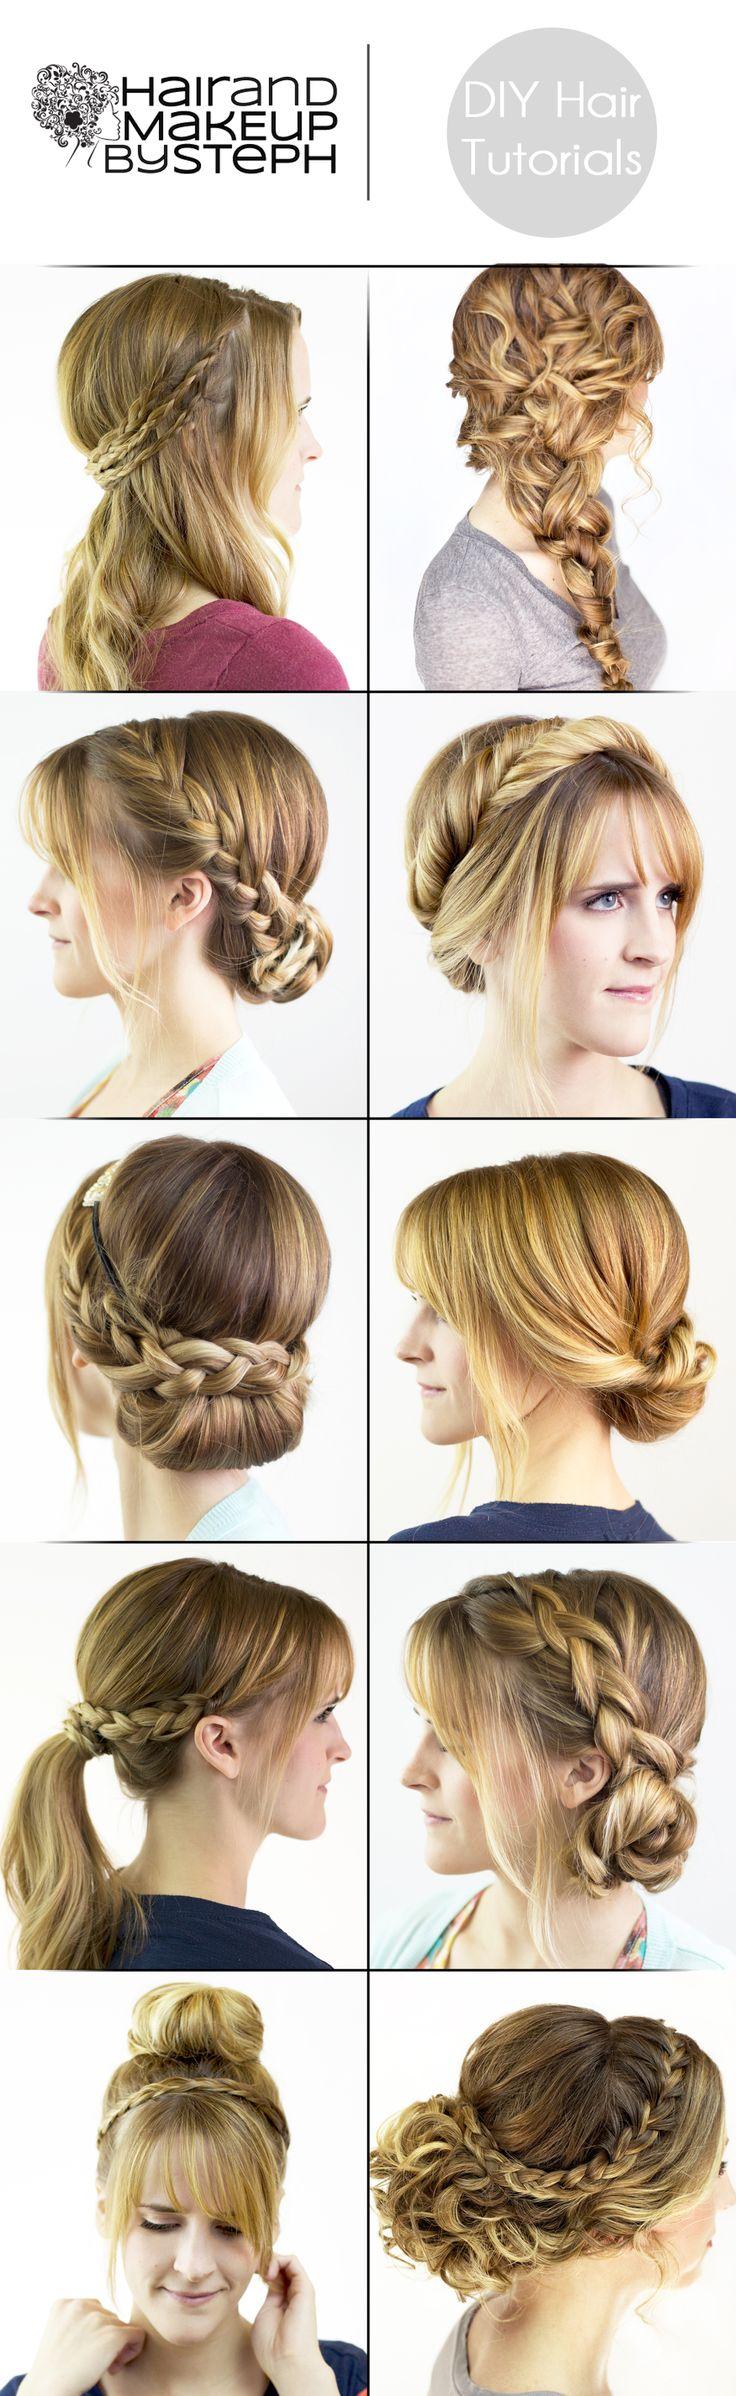 Cute DIY hairstyles for the church wedding...